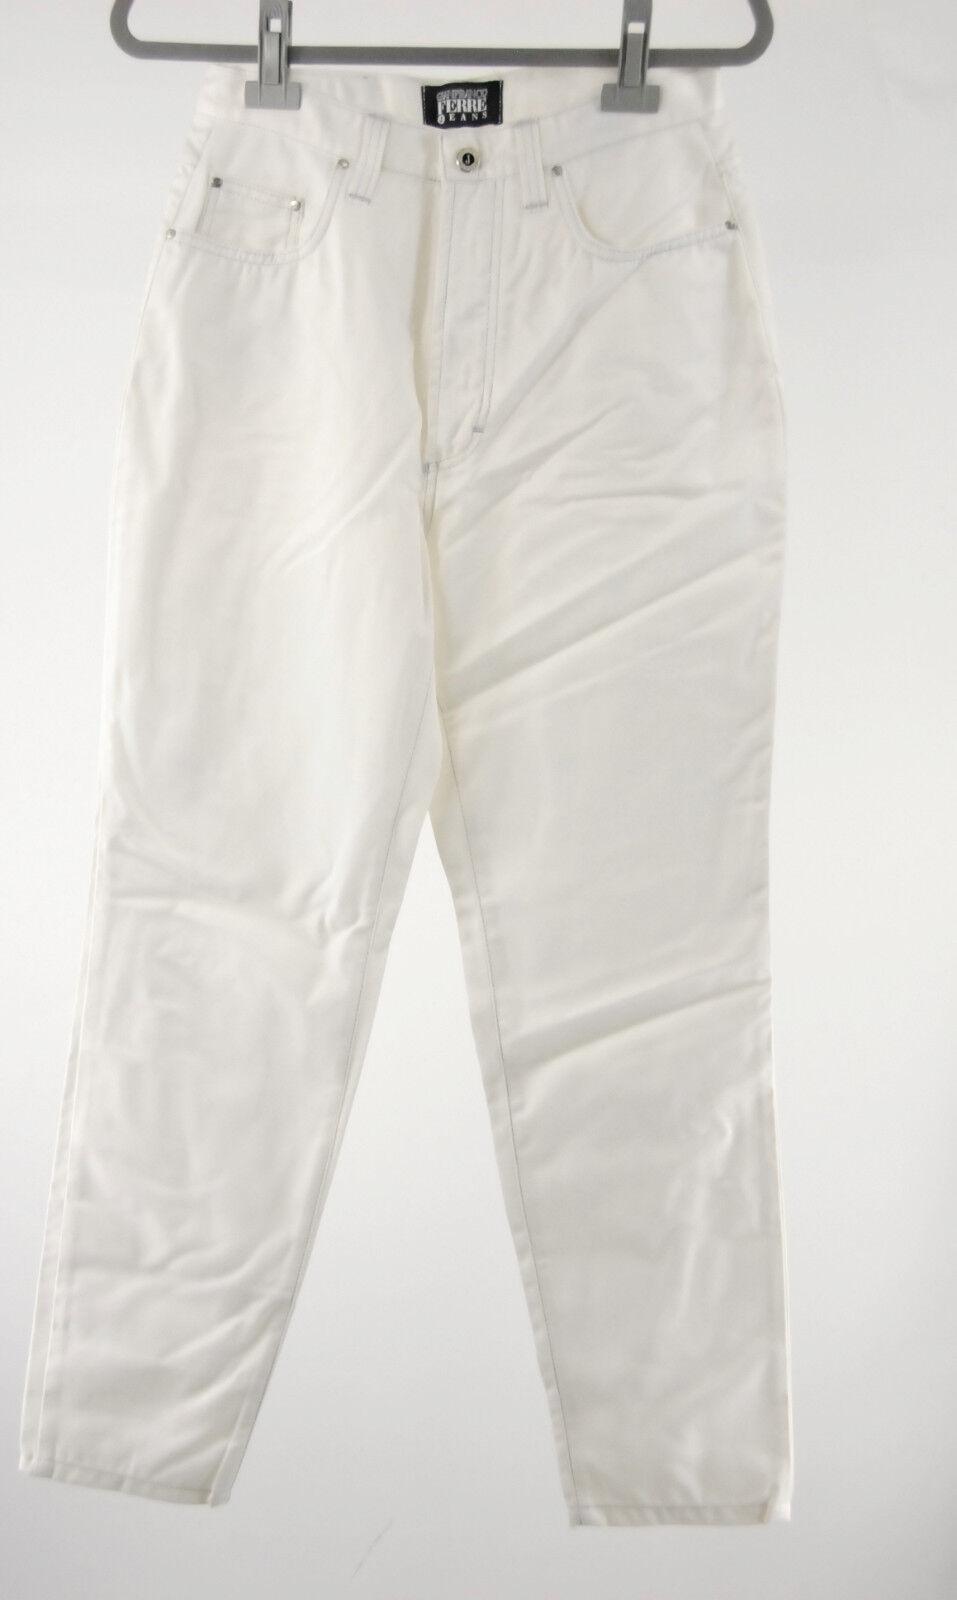 Gianfranco Ferre Jeans weiß 36 - 38 (D) 33 silbernaht  neu Ferré ITJ